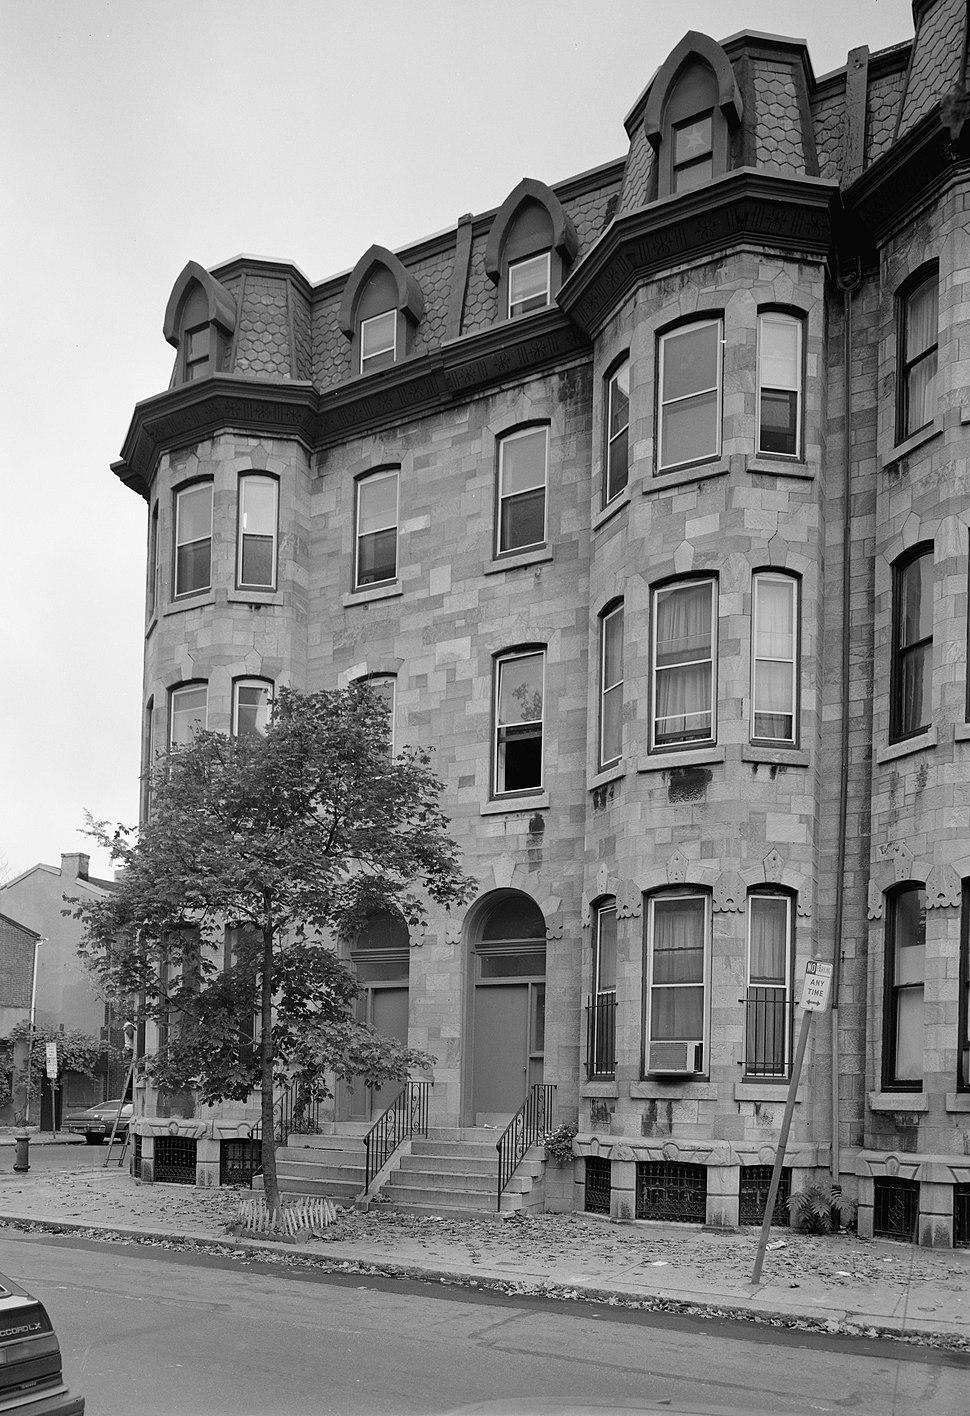 Edward Drinker Cope Houses, 2100-2102 Pine Street, Philadelphia (Philadelphia County, Pennsylvania)